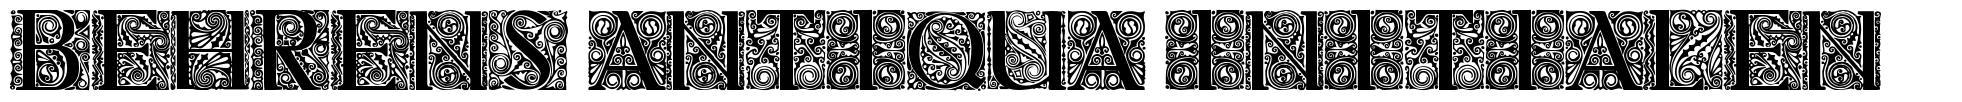 Behrens Antiqua Initialen font